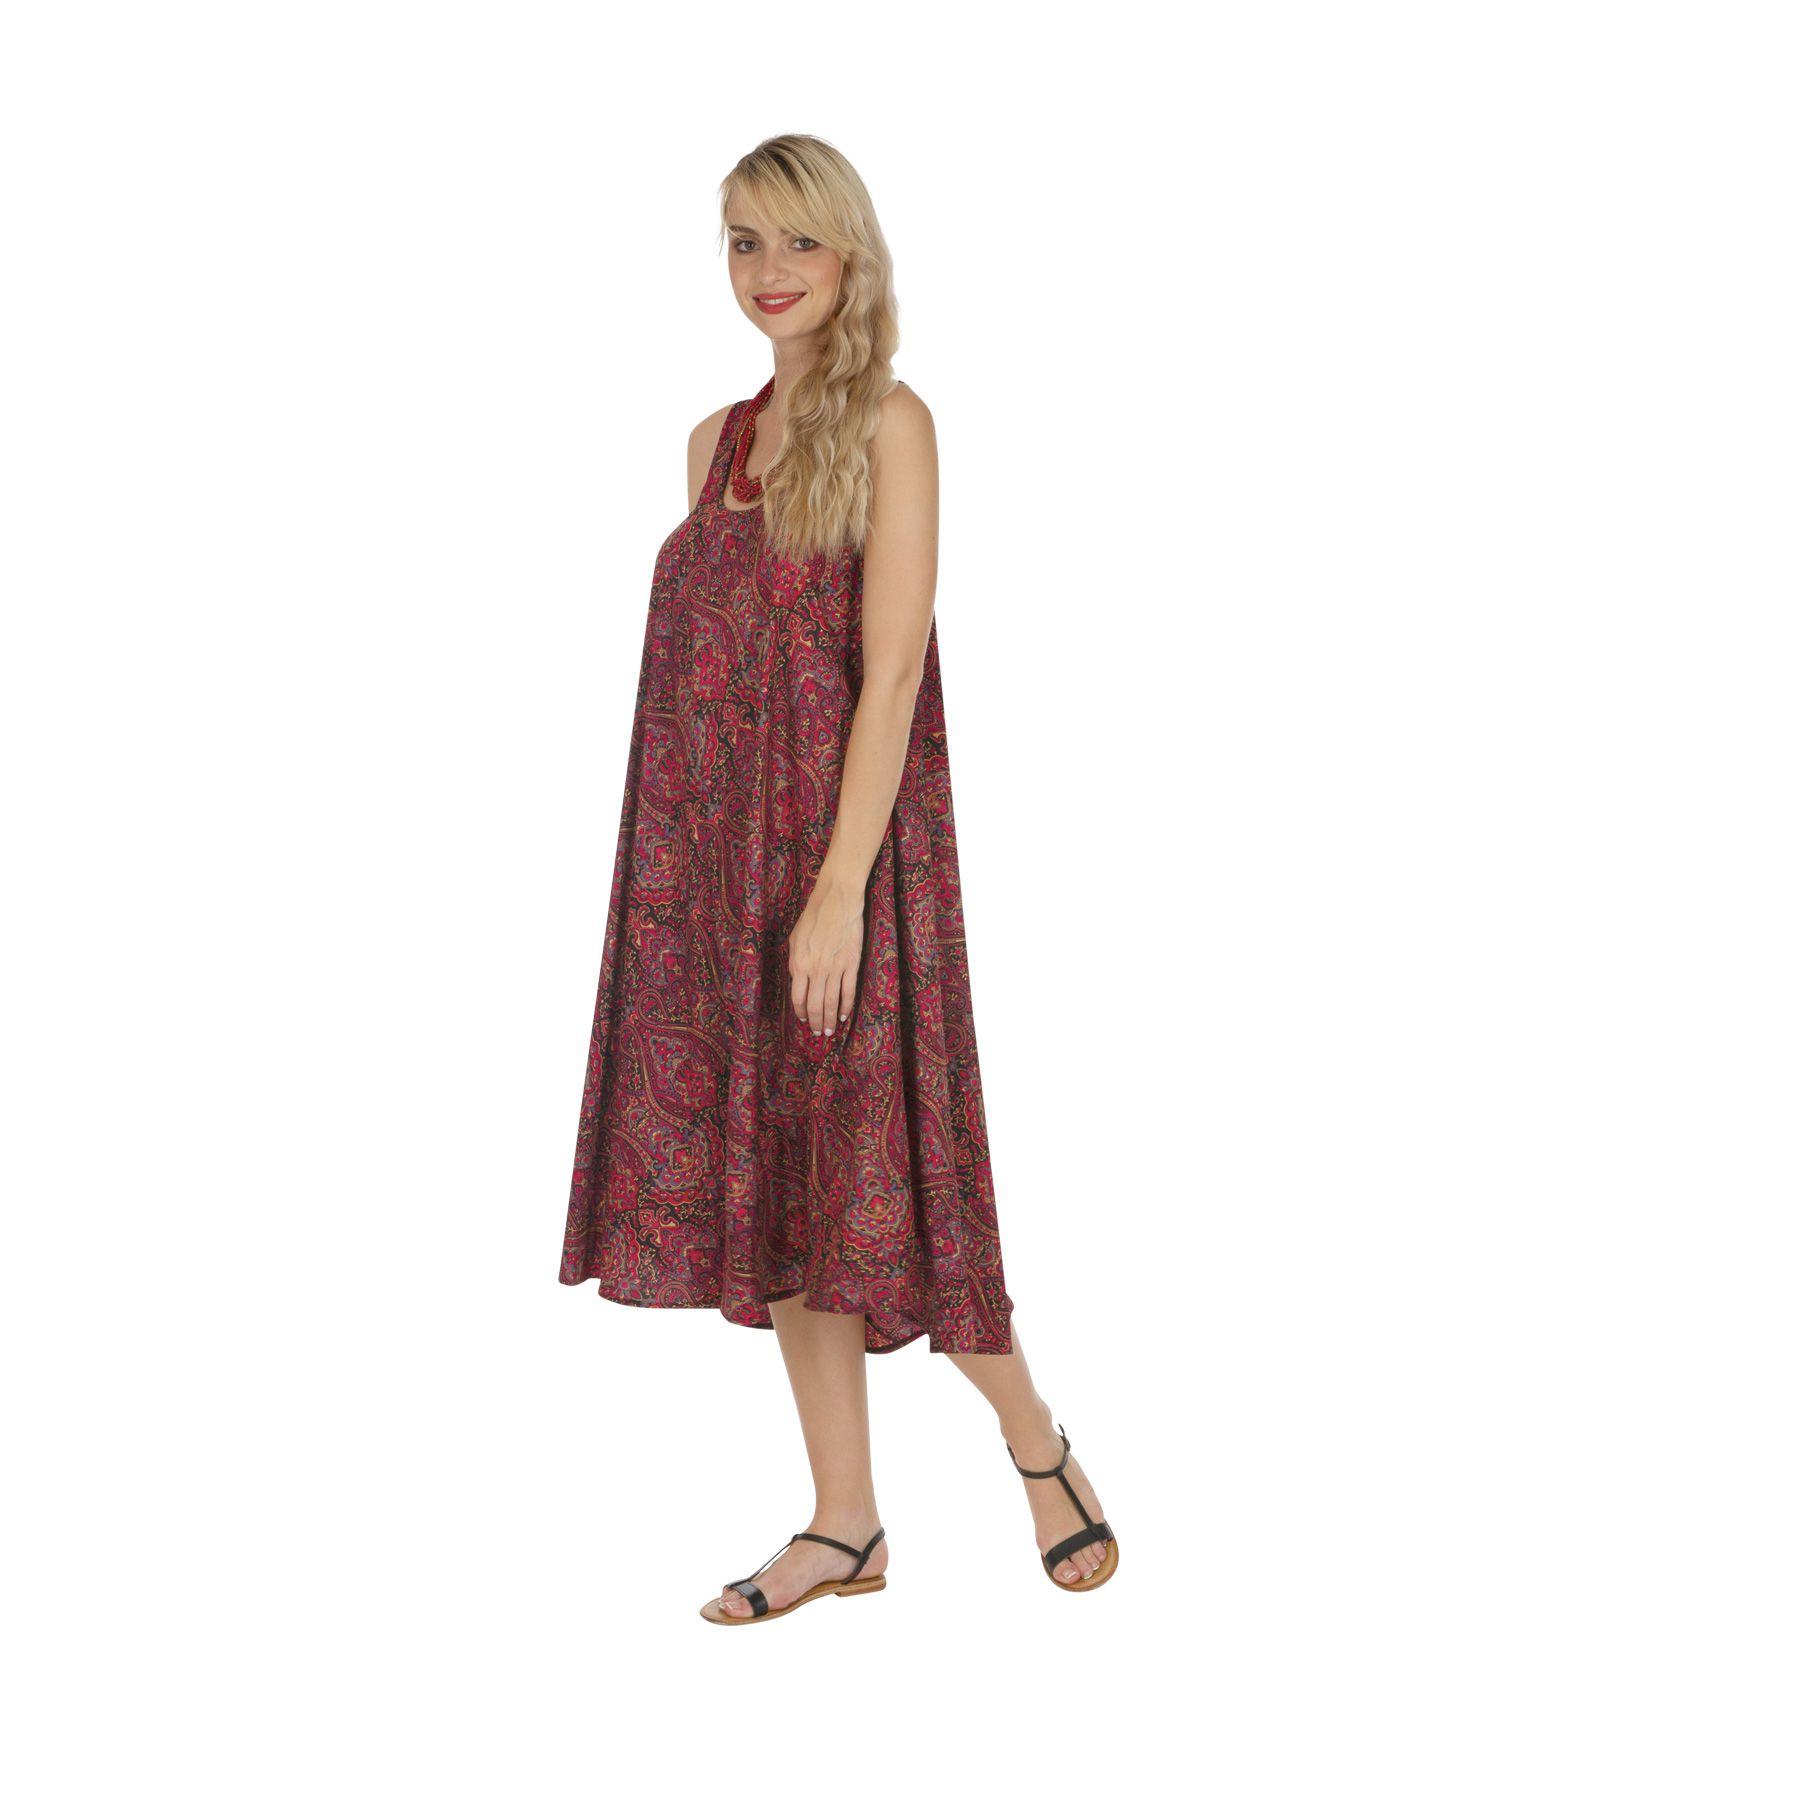 Robe longue été femme à bretelles style bohème Kirakirou